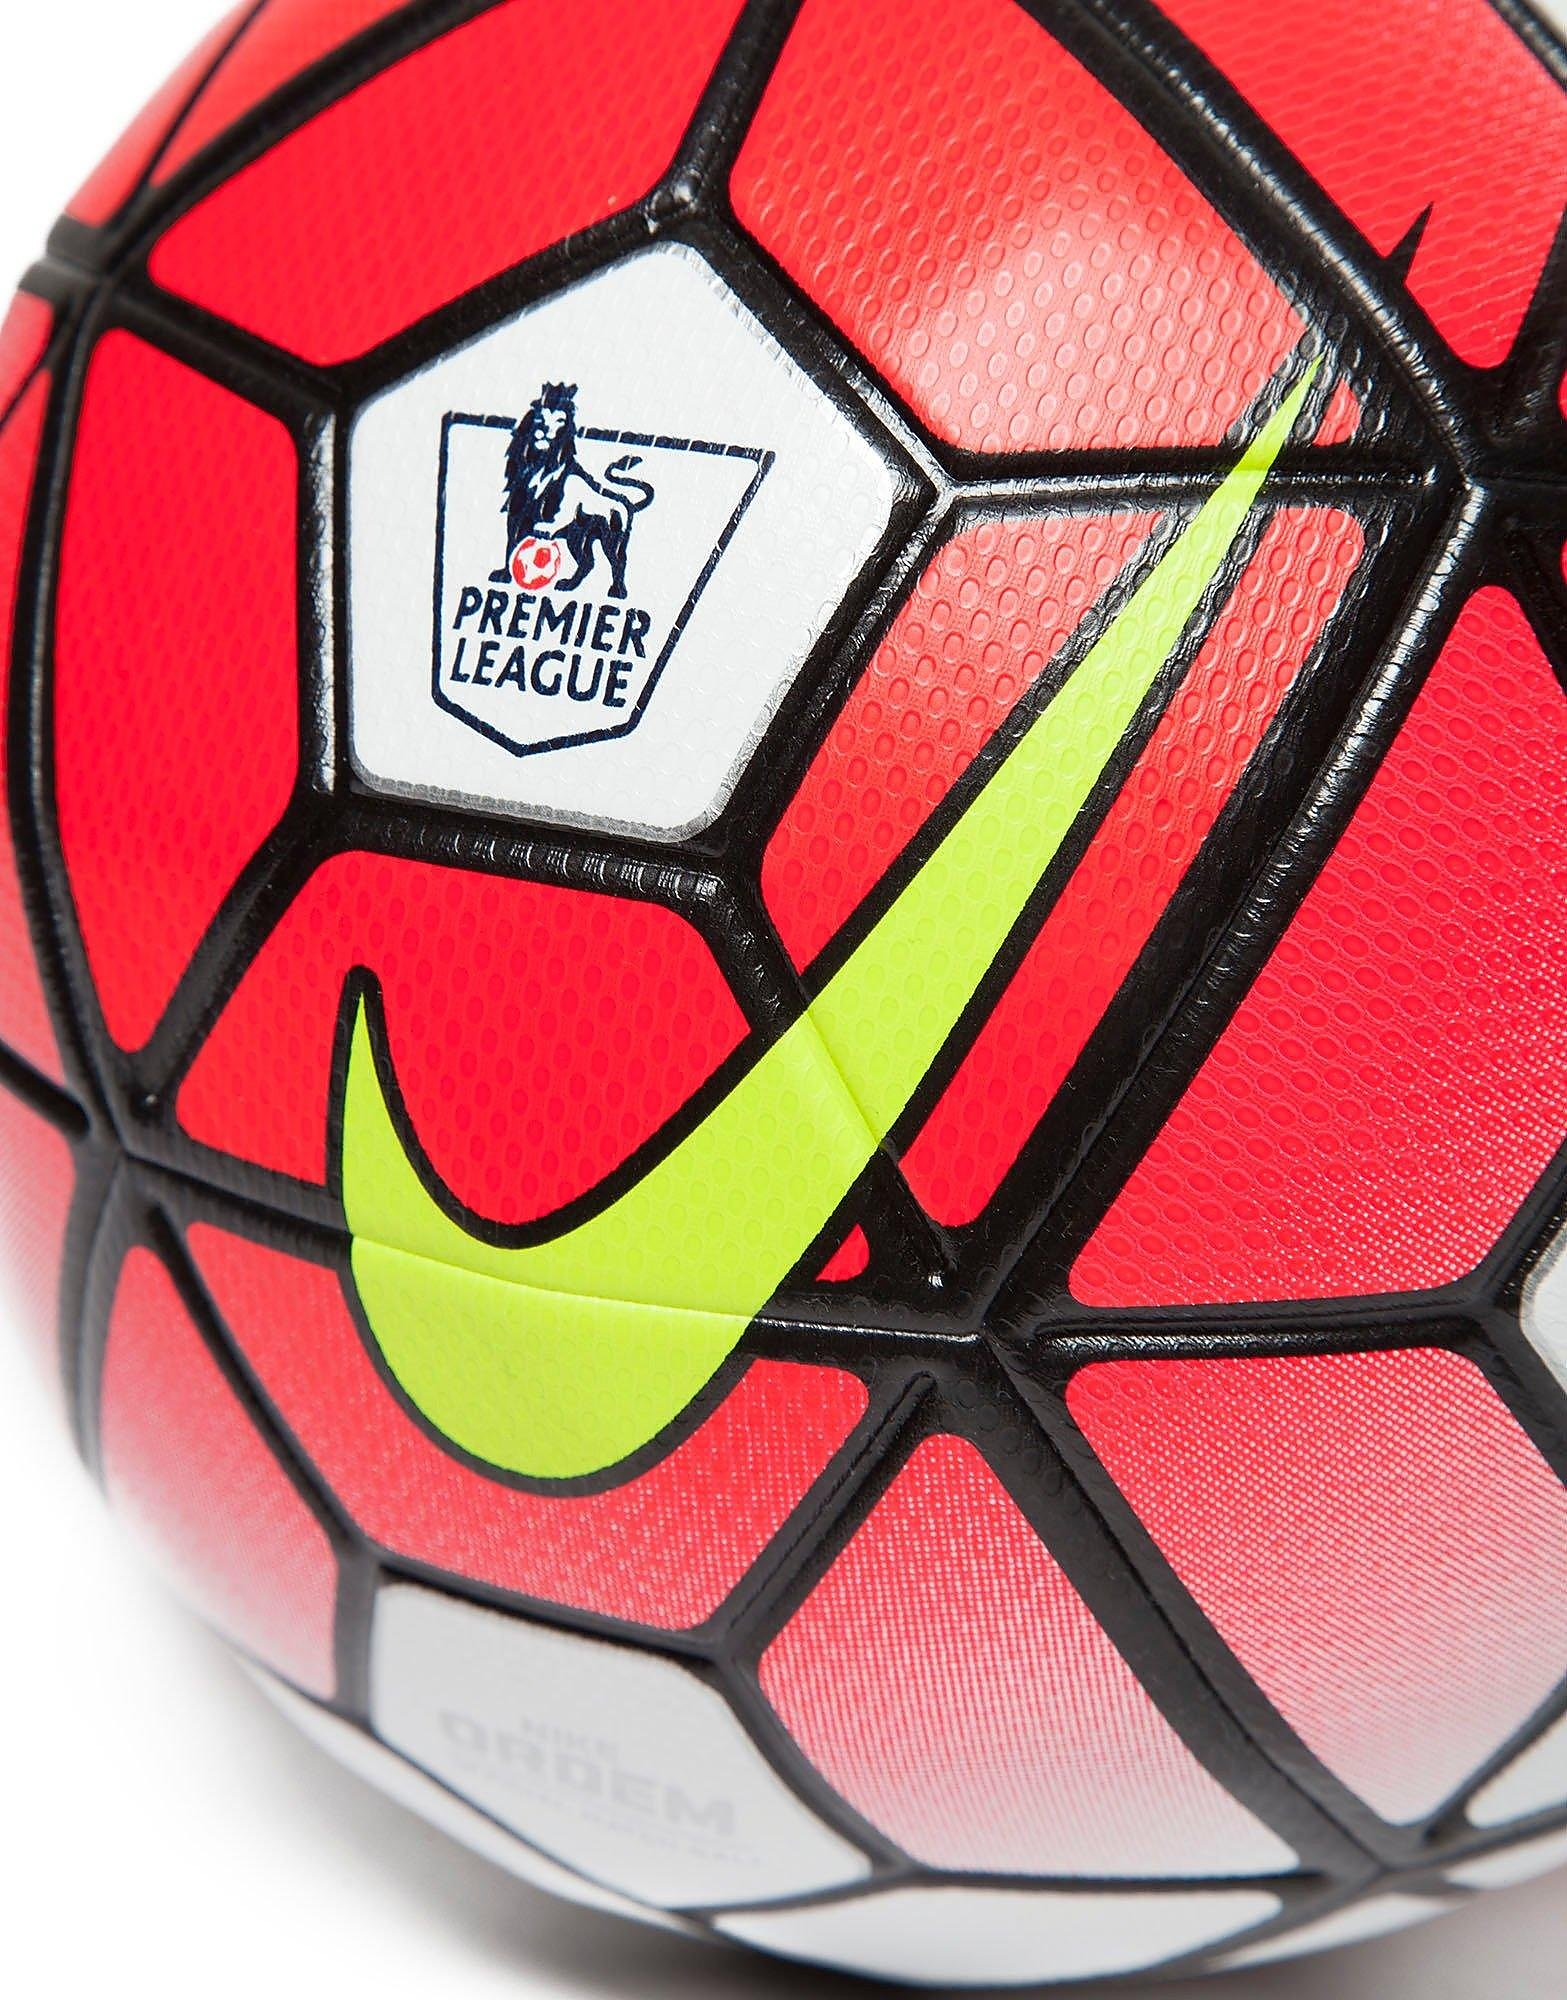 Nike Premier League 2015/2016 Skills Football